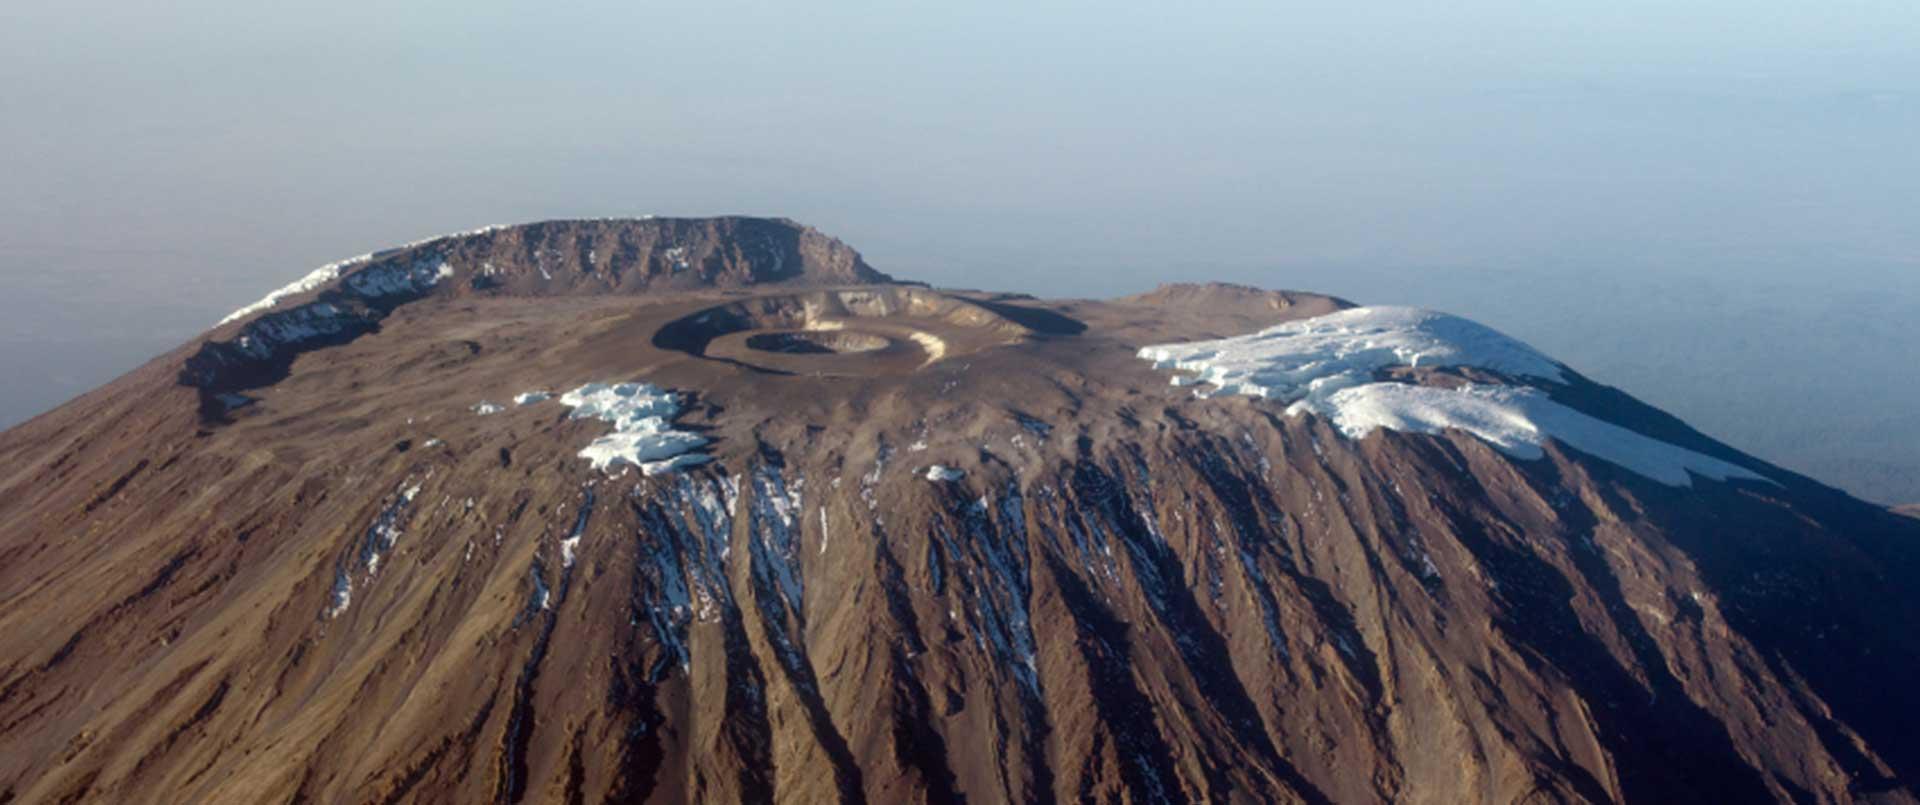 Charity: Mount Kilimanjaro Trek